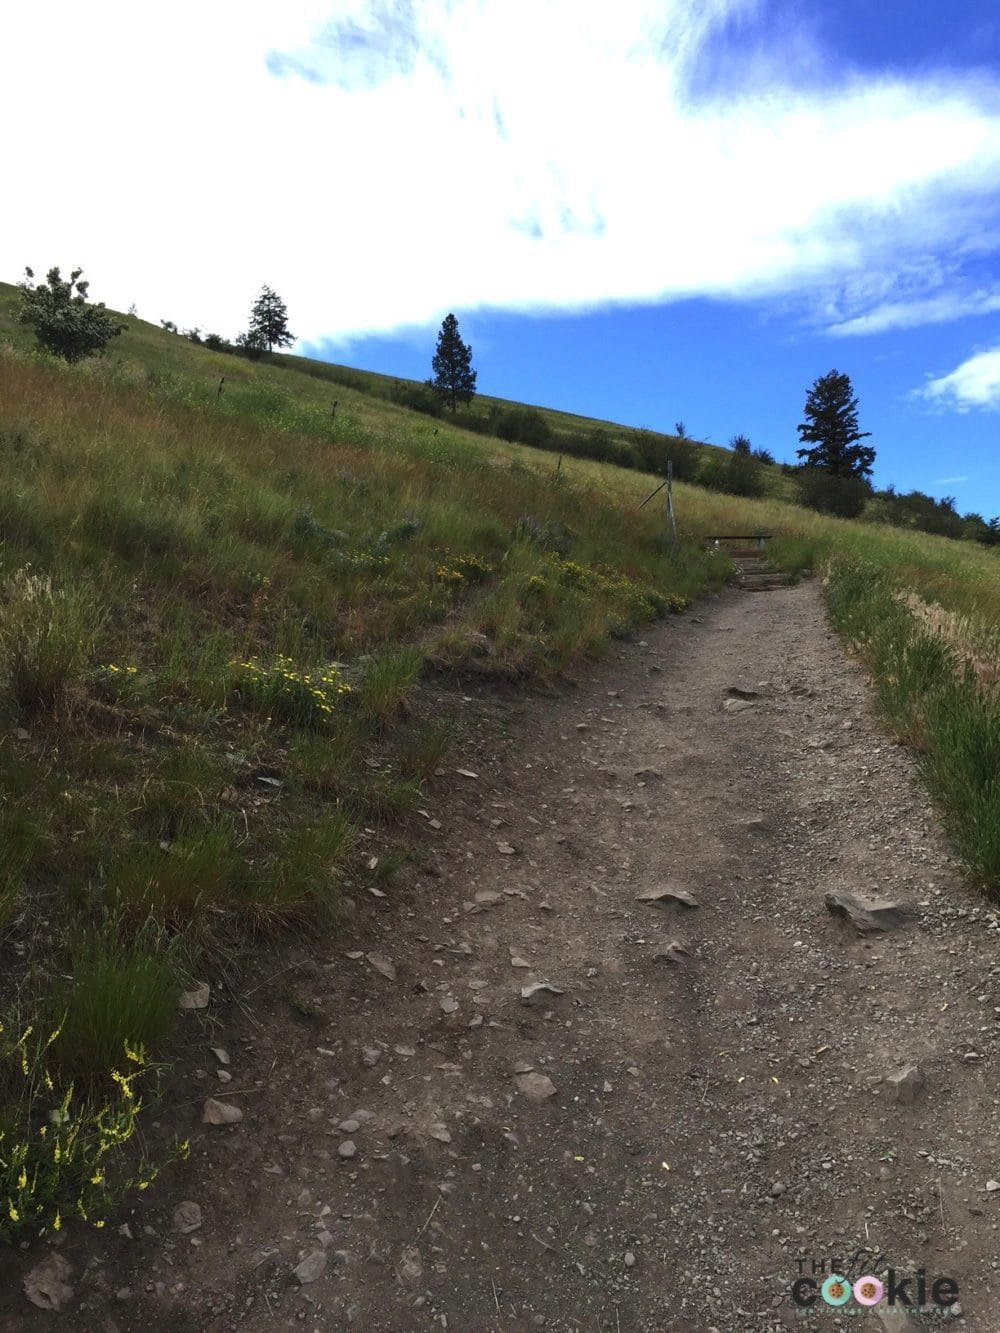 The M Trail Missoula - @thefitcookie #hike #montana #trail #fitfluential